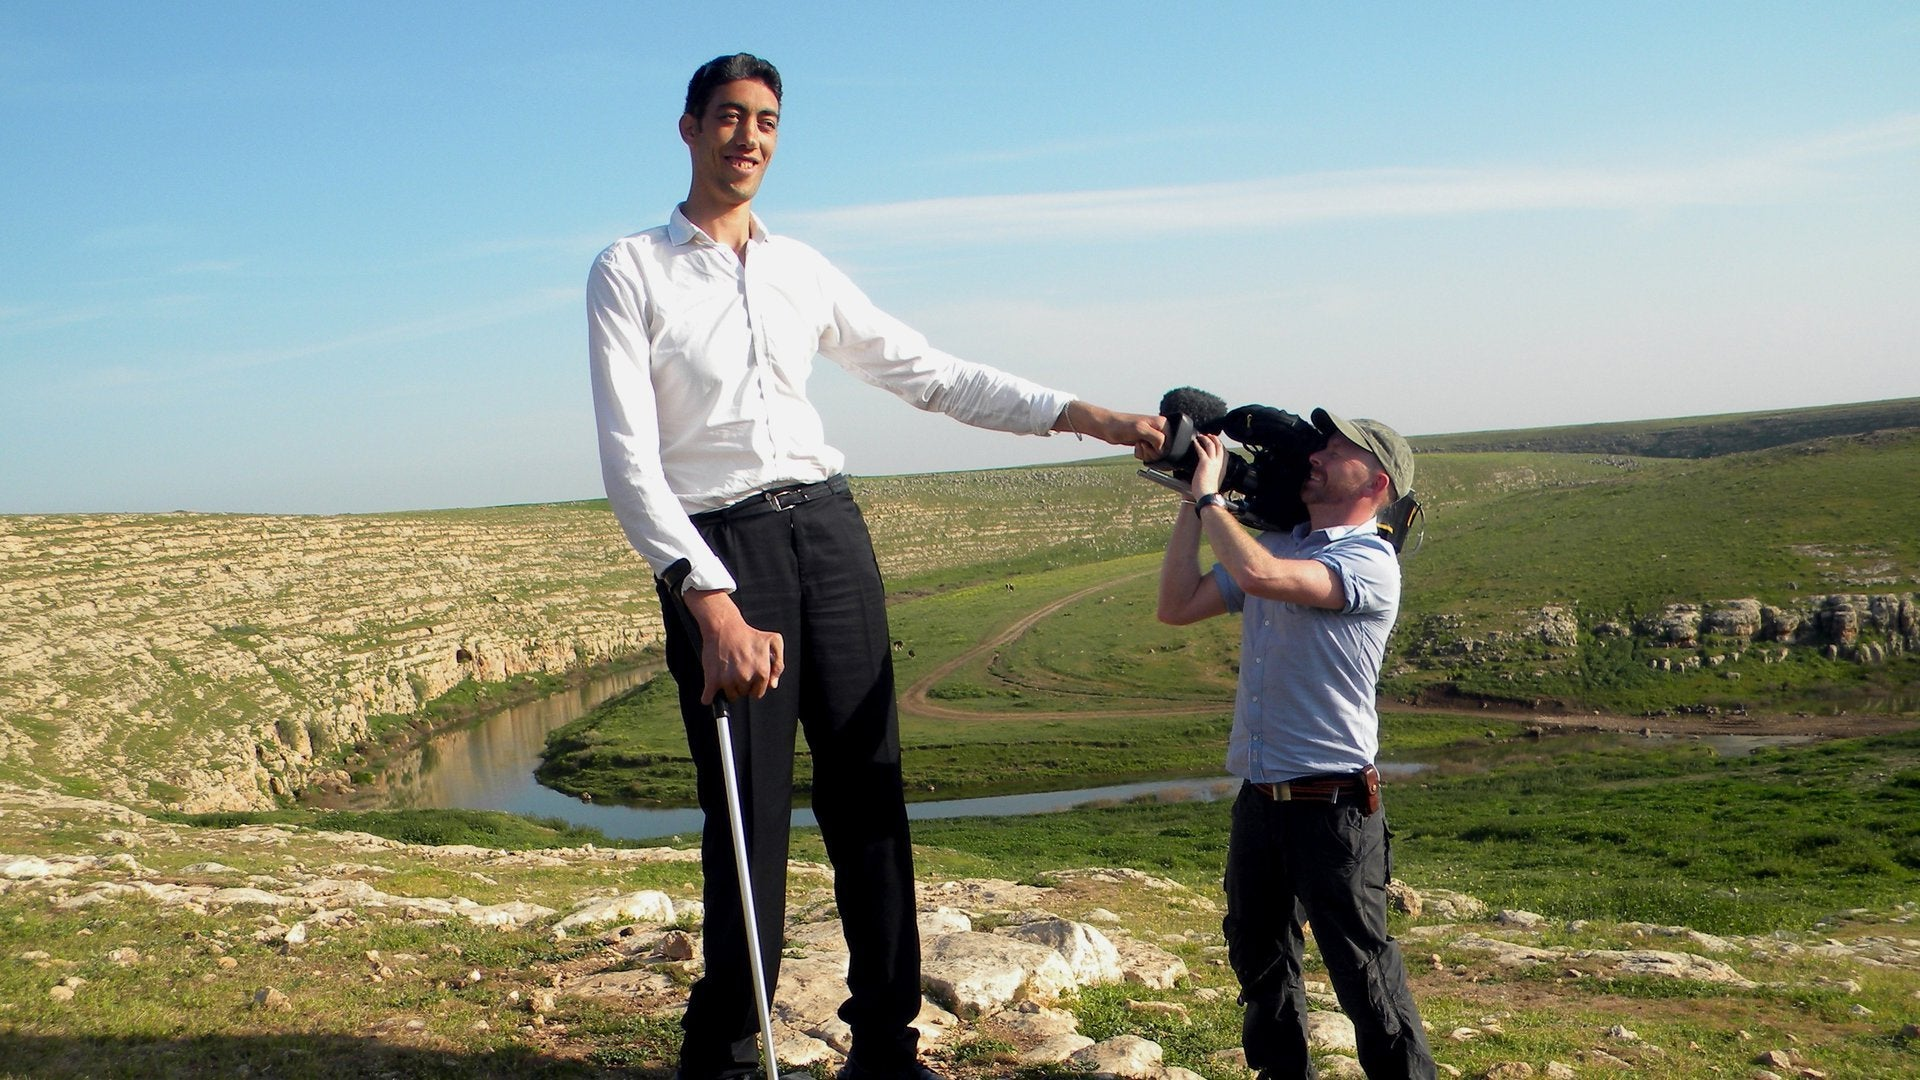 World's Tallest Man: Still Growing